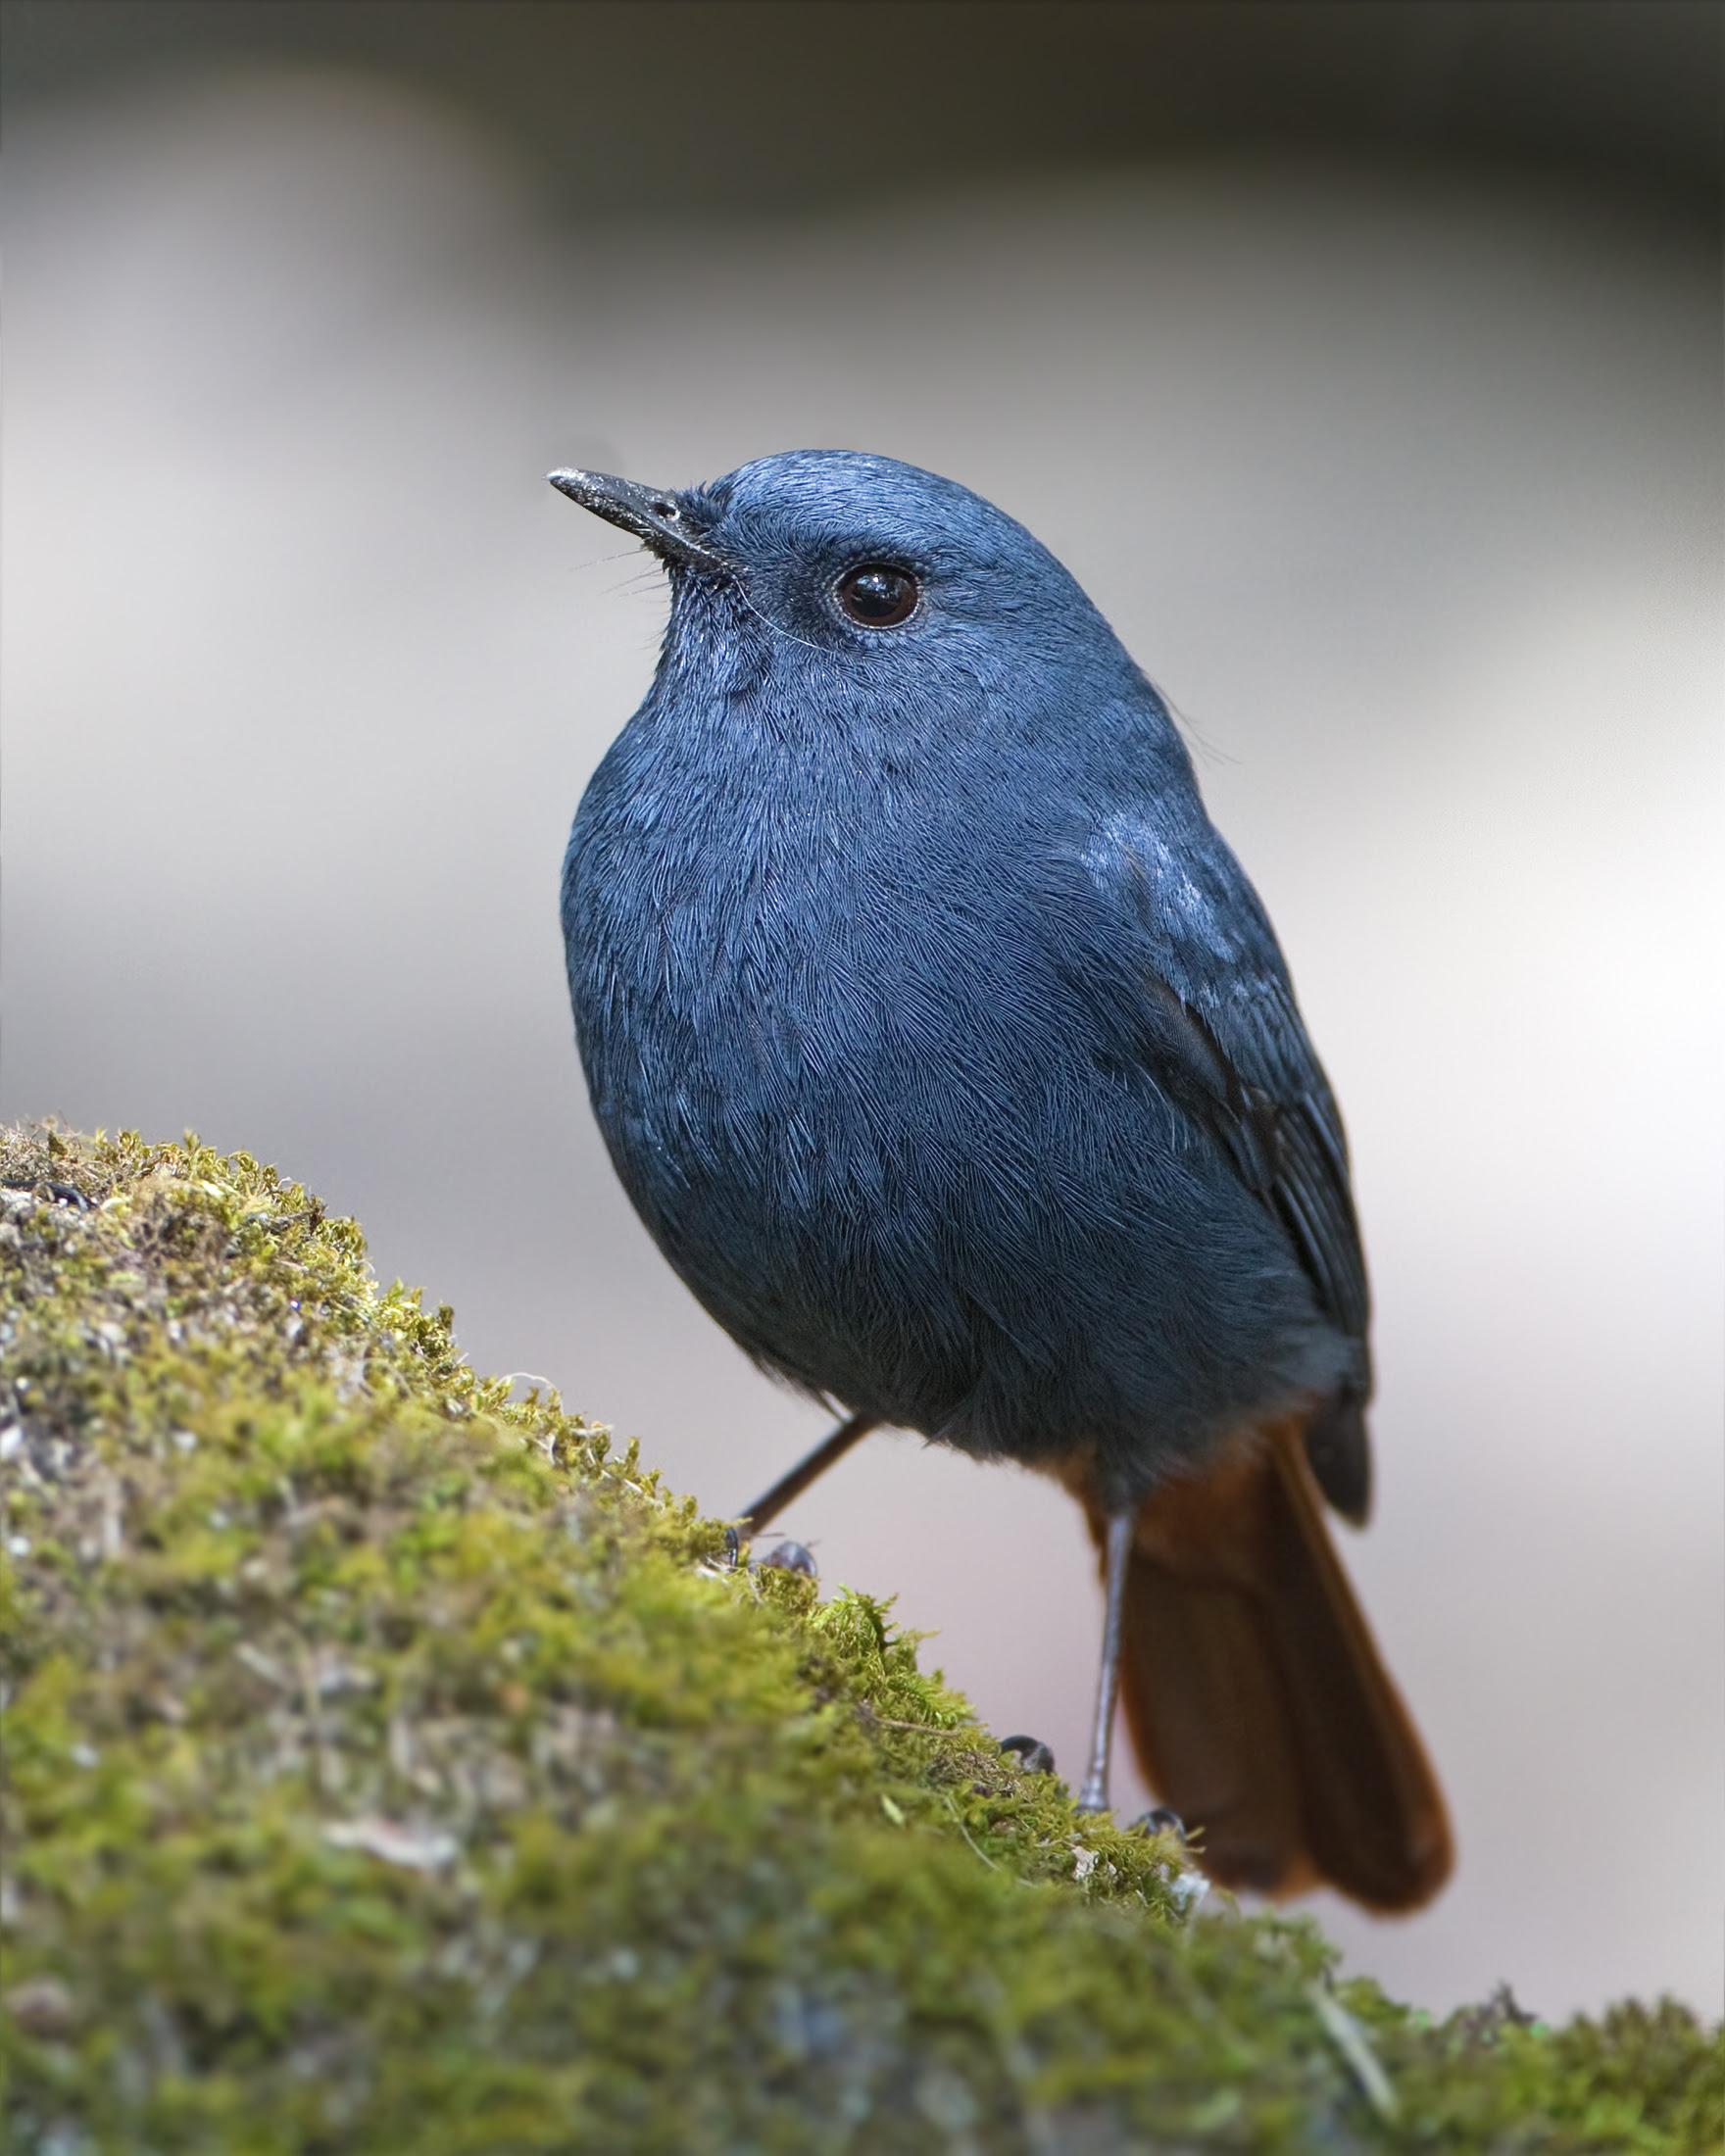 http://upload.wikimedia.org/wikipedia/commons/4/4e/Rhyacornis_fuliginosus_-_Doi_Inthanon.jpg